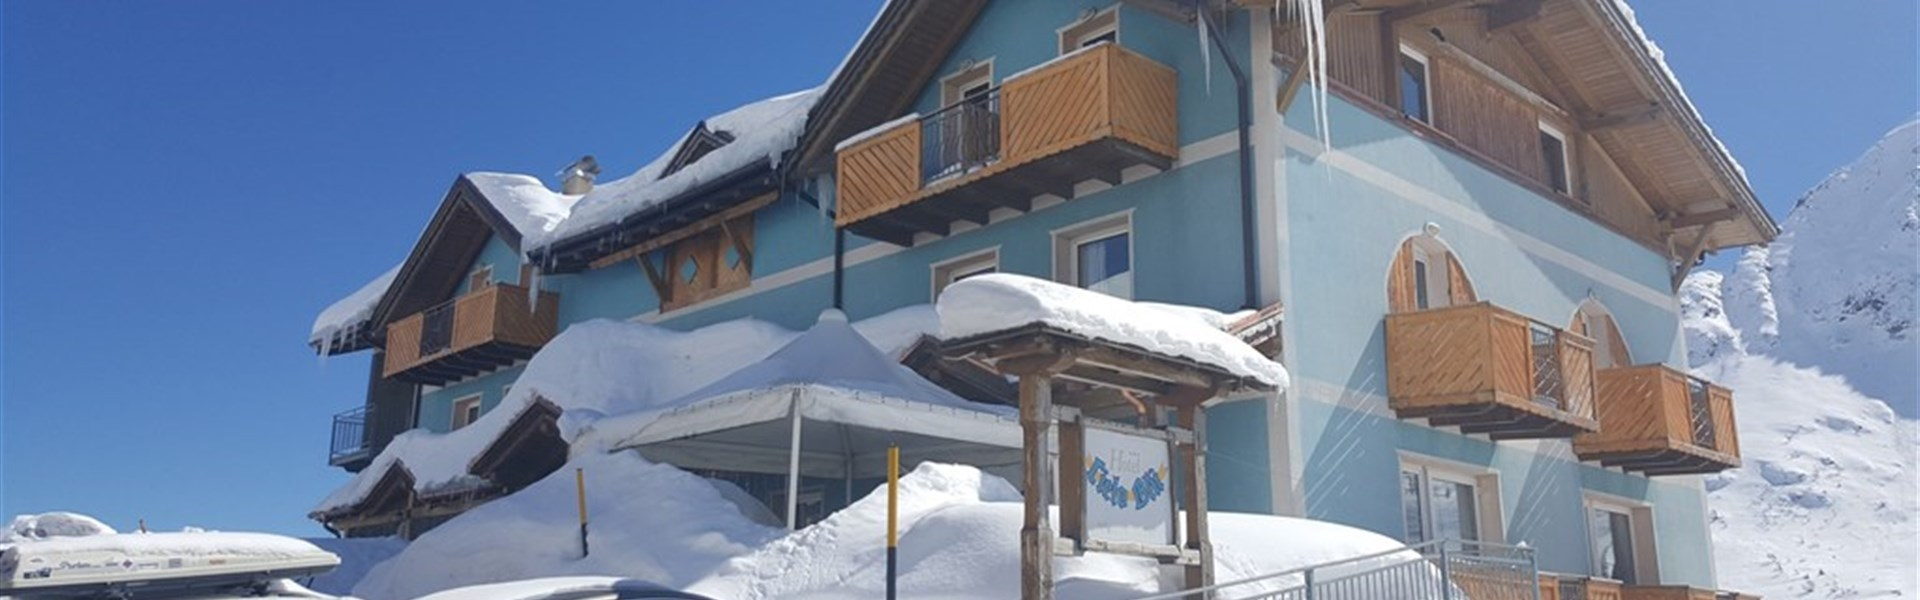 Marco Polo - Hotel Cielo Blu -